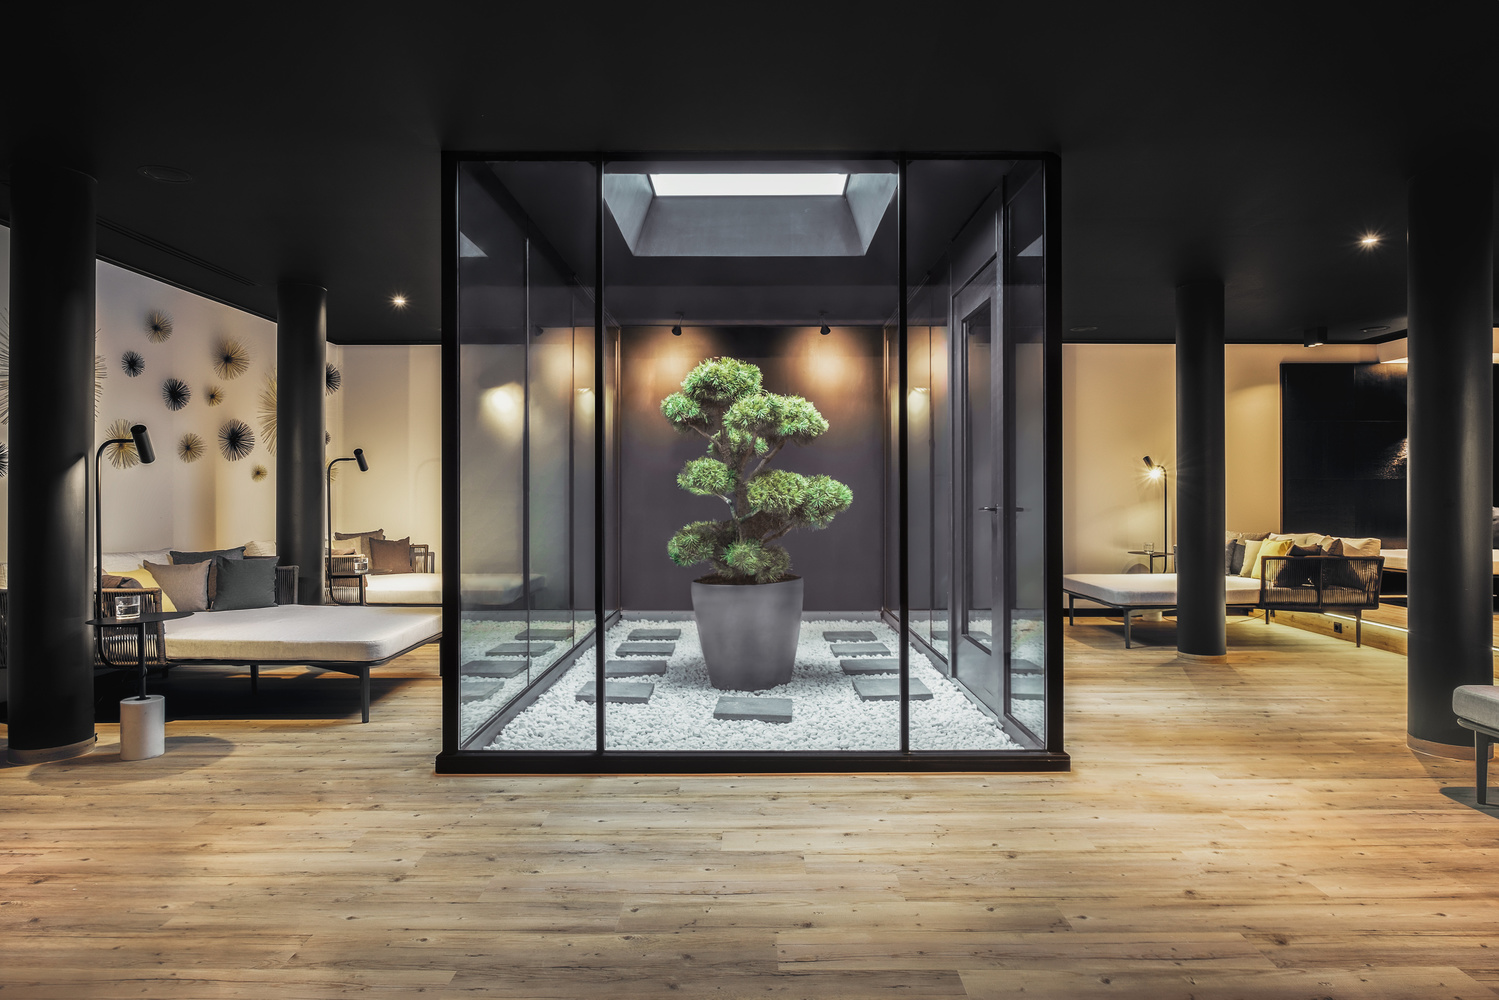 Relaxation Room & Natural Light Atrium. by Matthias Dengler